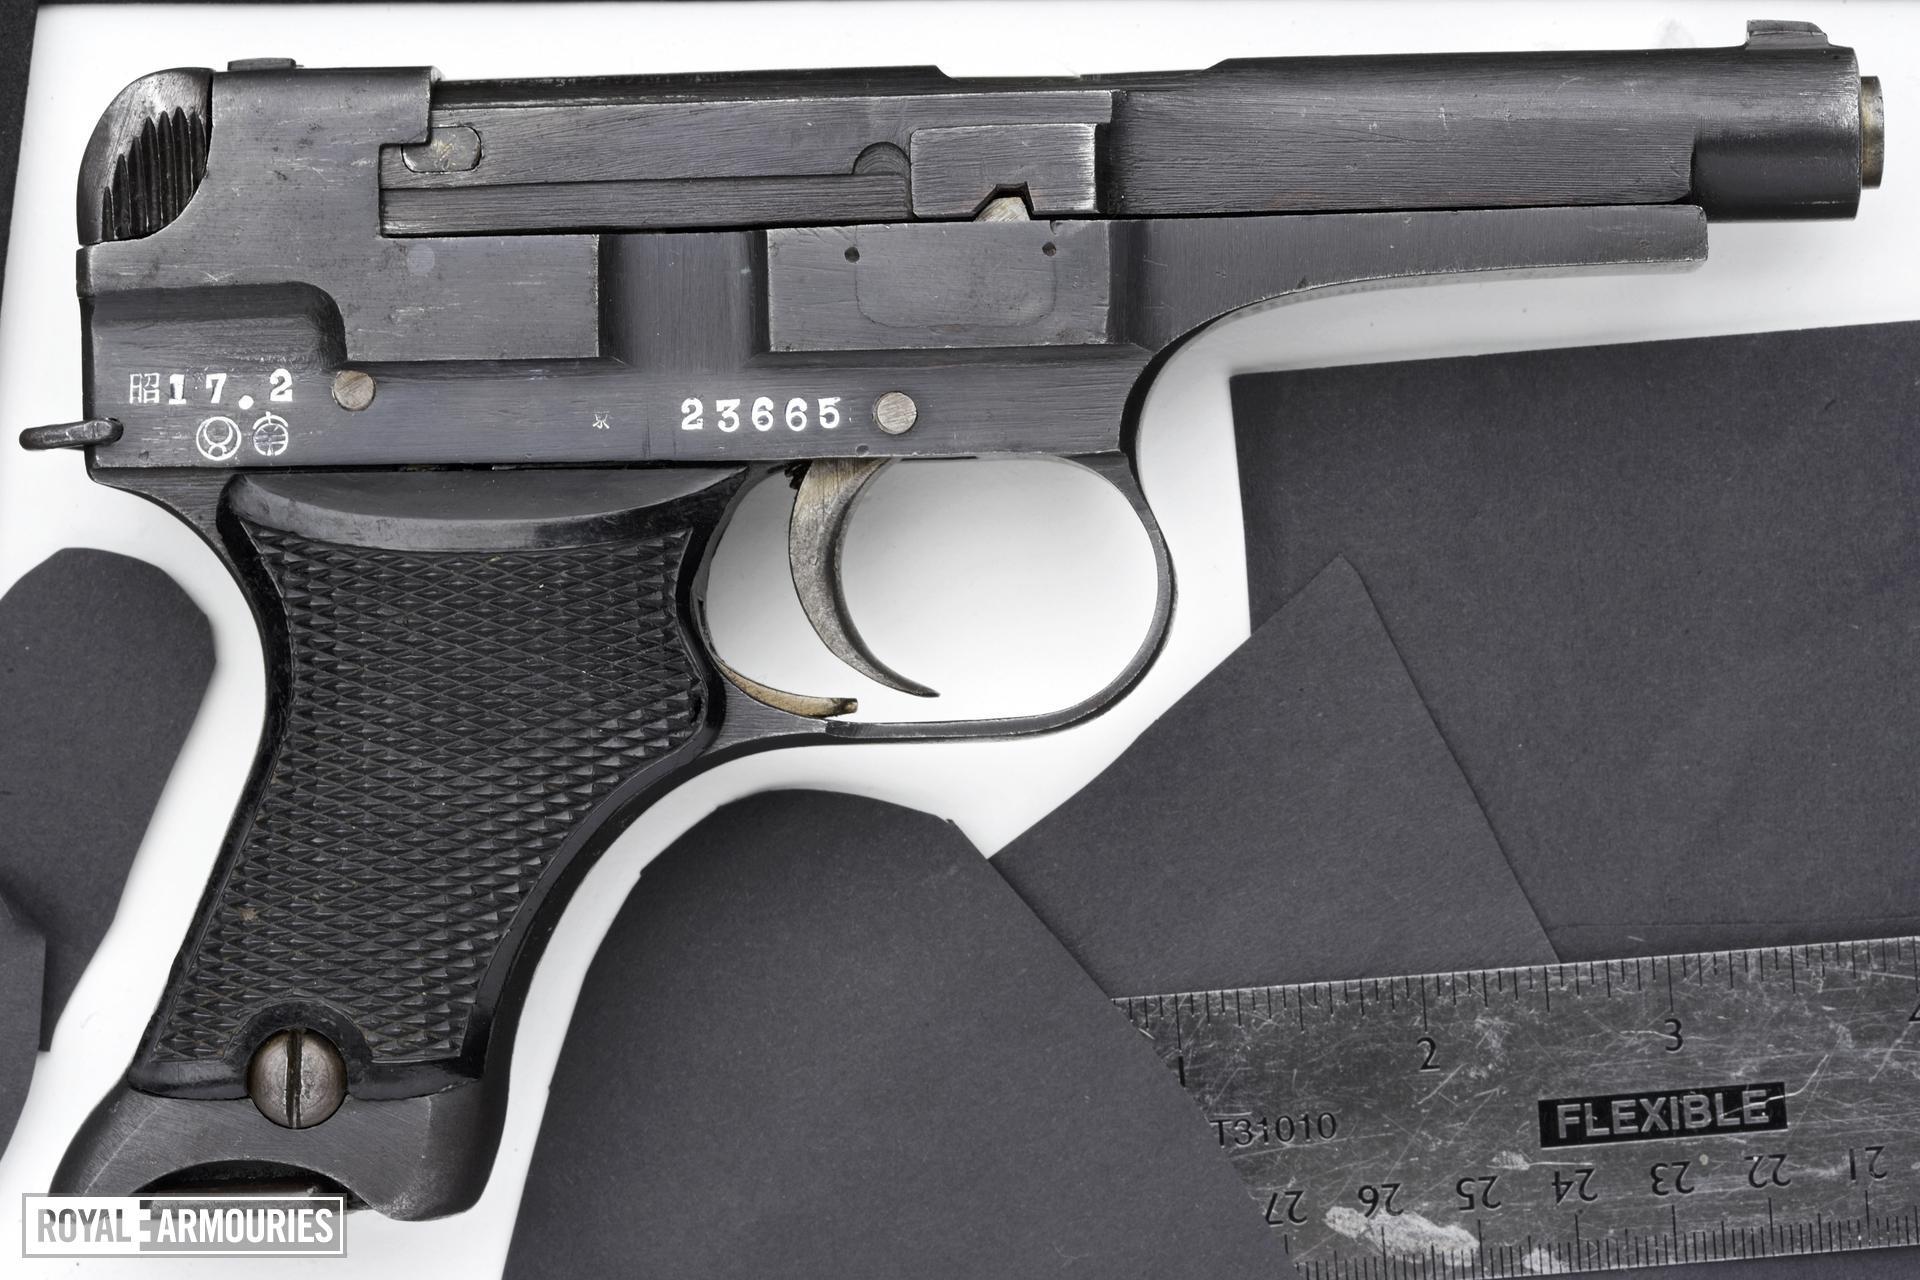 Centrefire self-loading pistol - Nambu Type 94